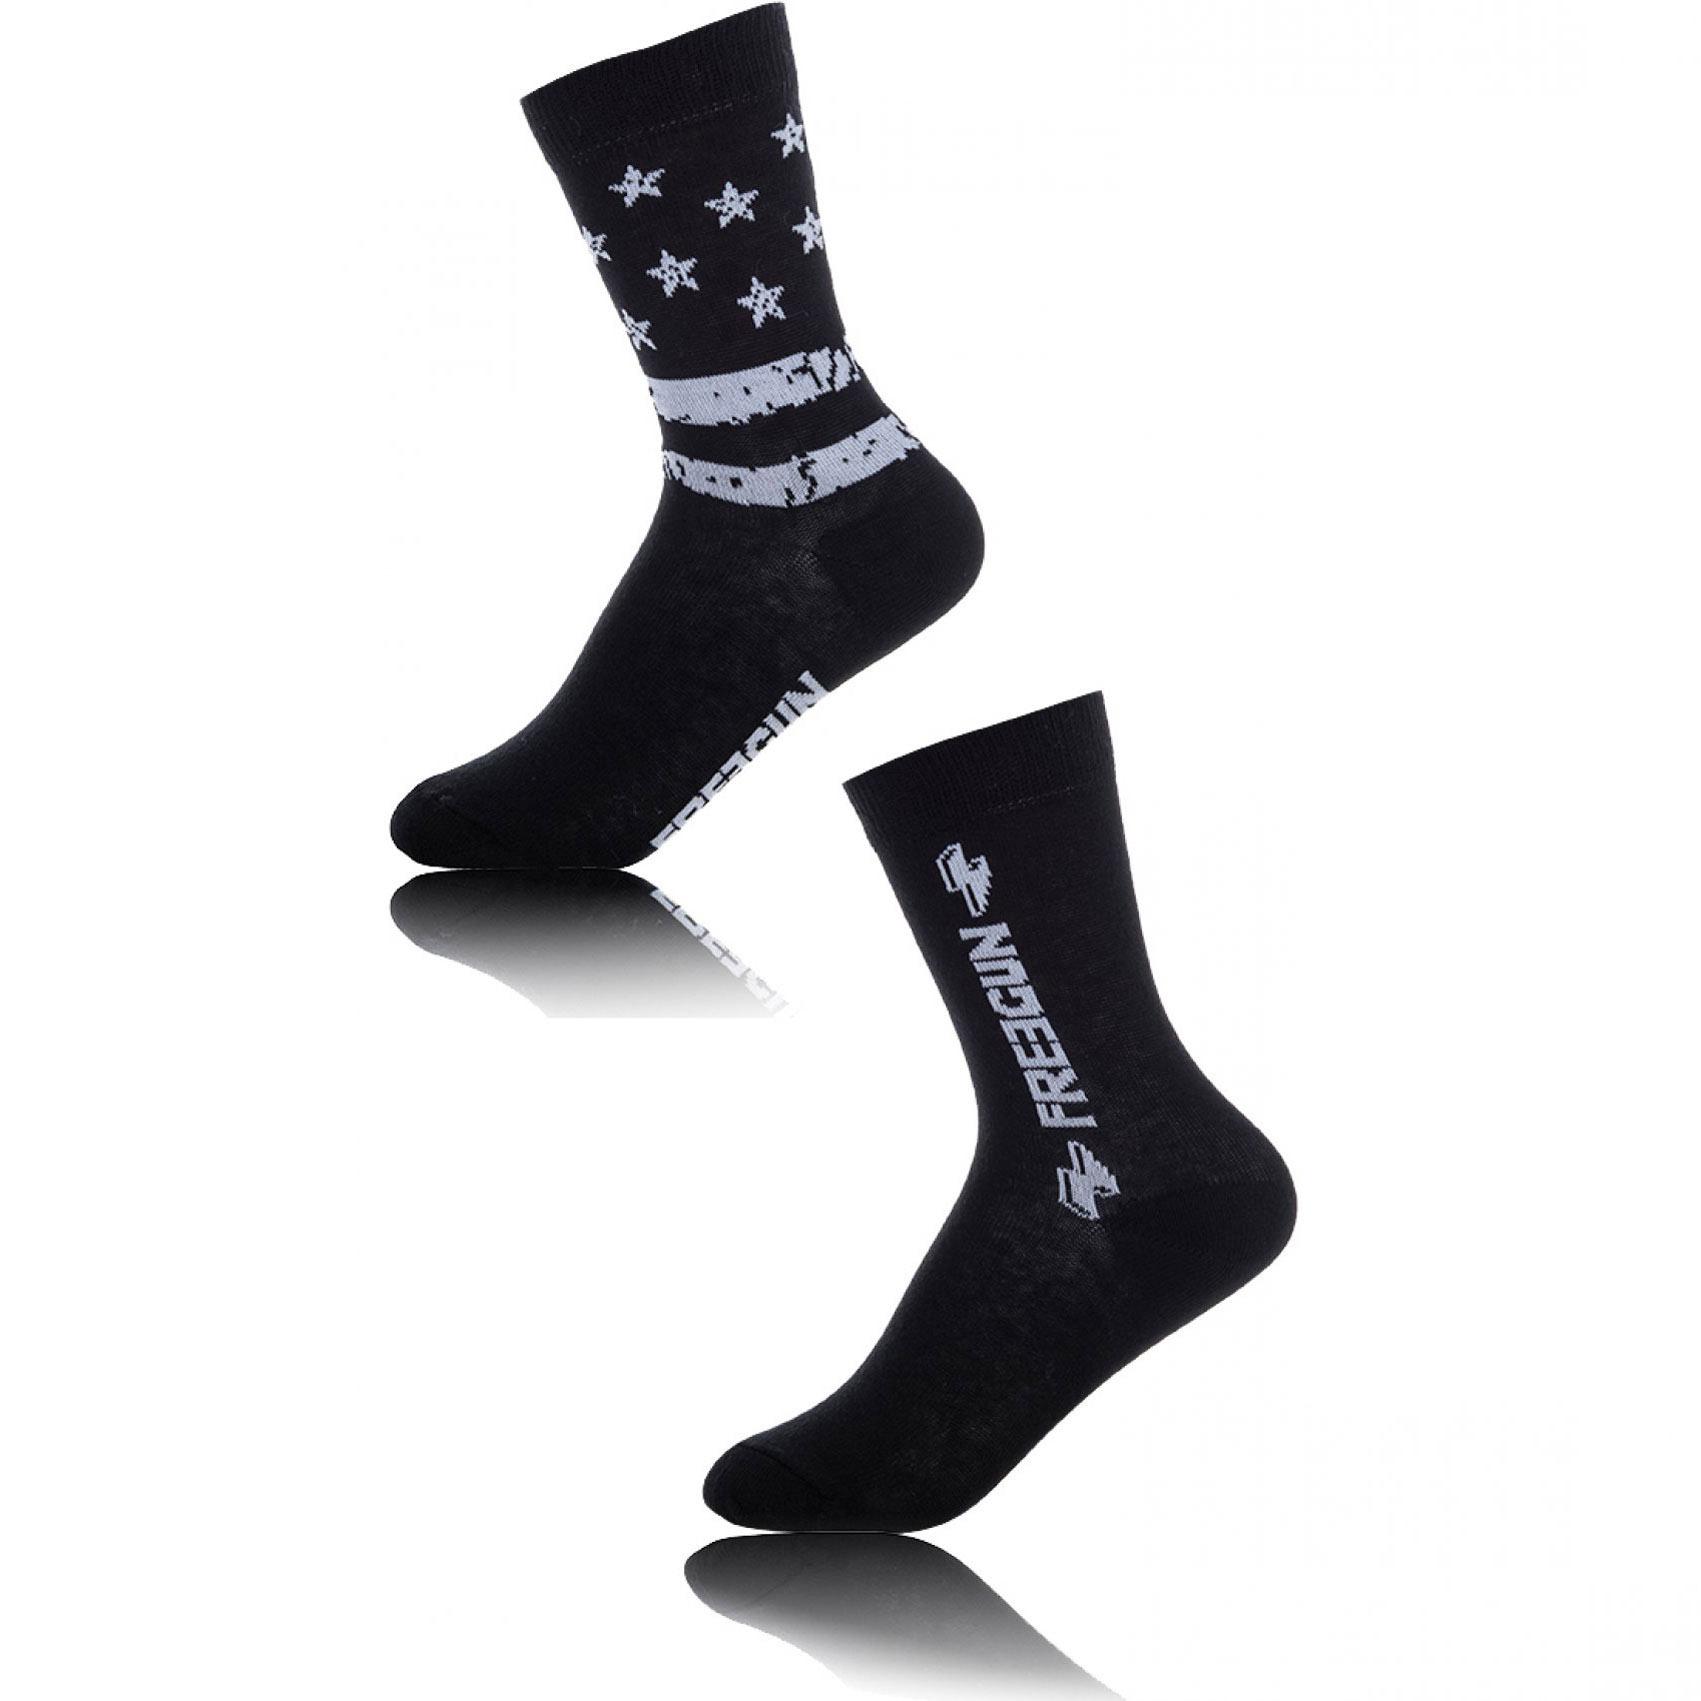 Lot de 2 paires de chaussettes garçon freegun stars (photo)